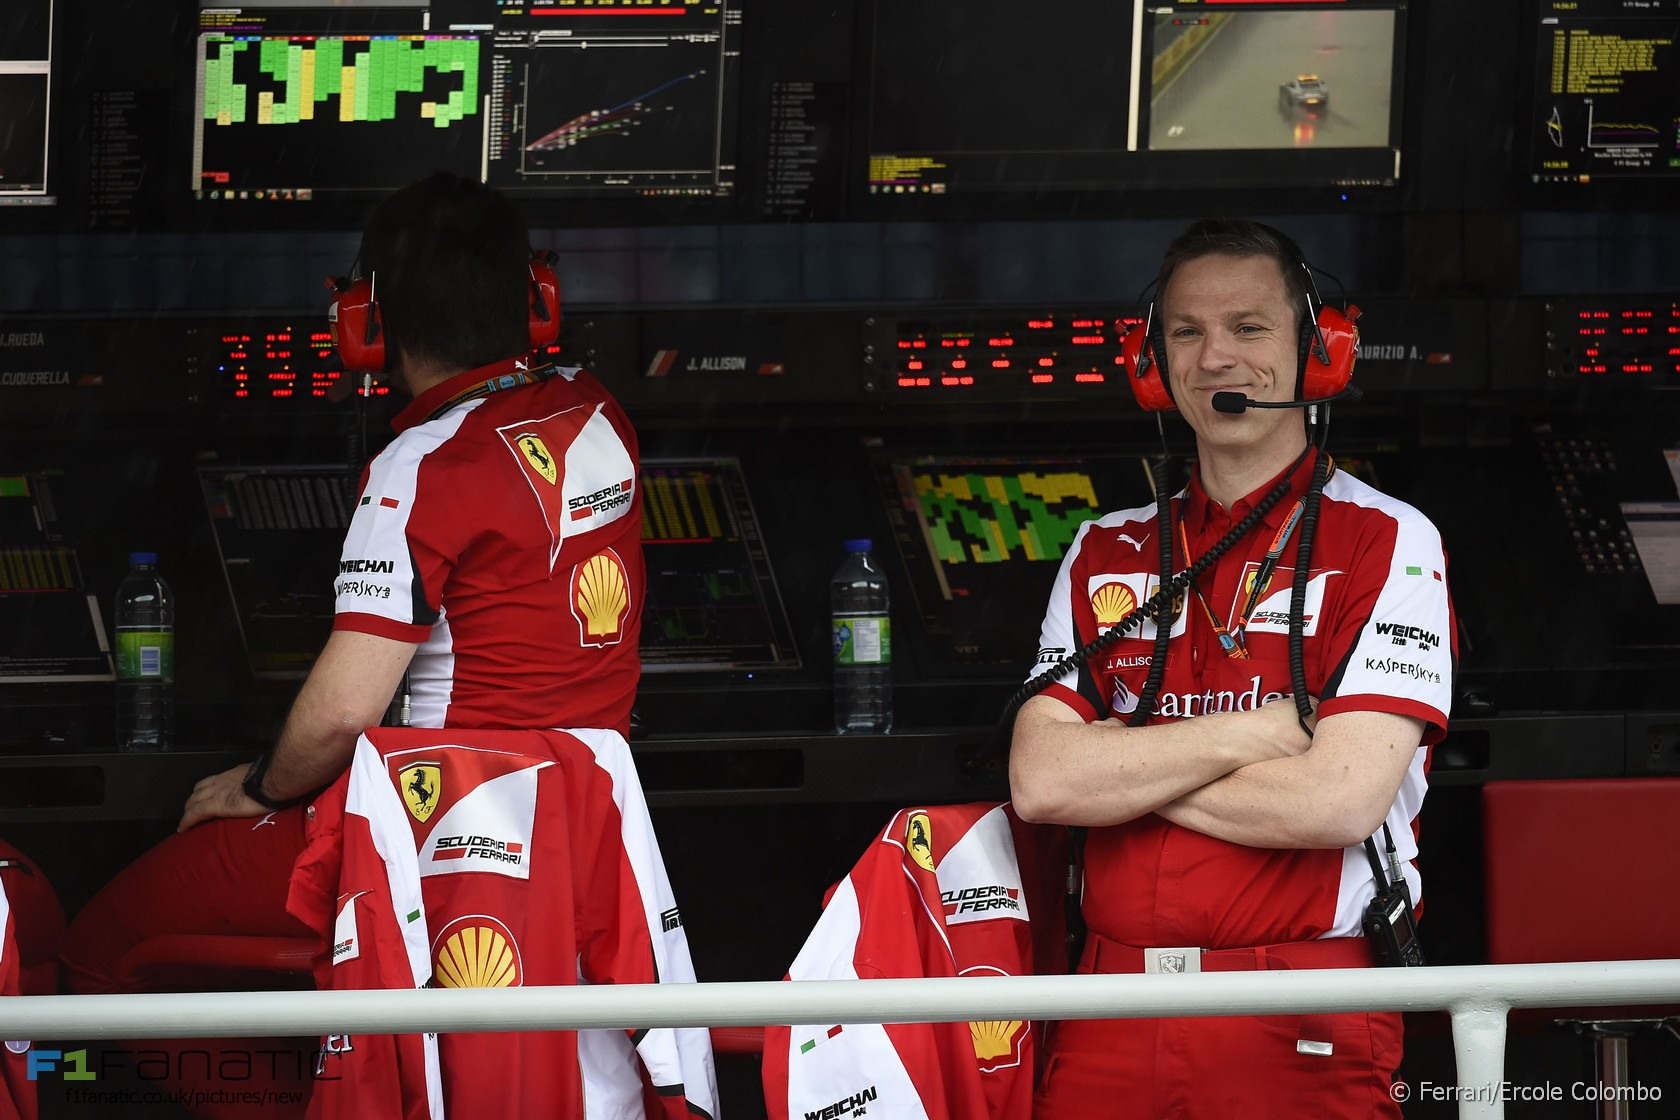 James Allison, Ferrari, Circuit Gilles Villeneuve, Montreal, 2015